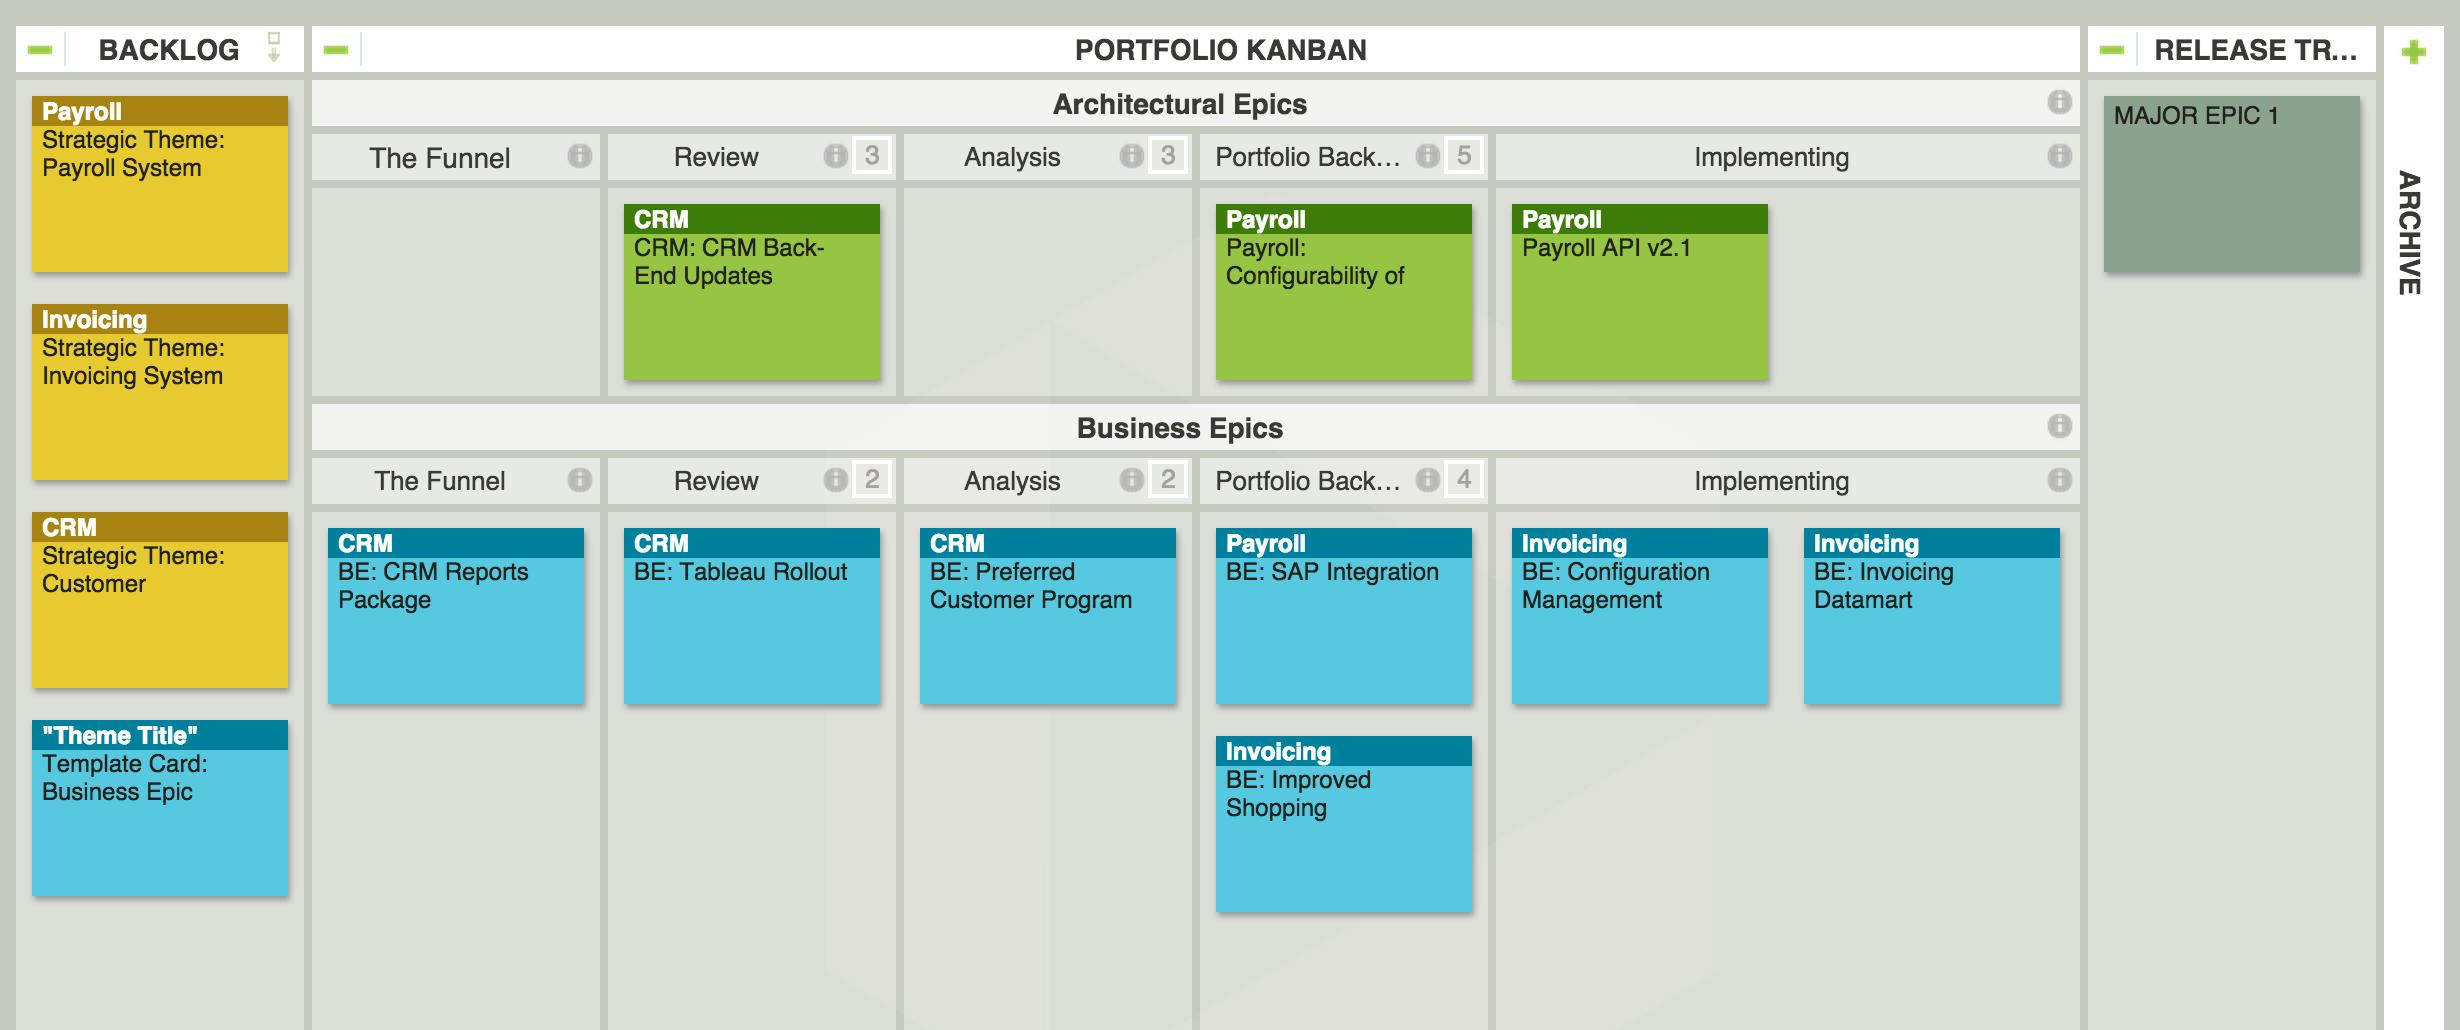 10 Kanban Board Examples For Development And Operations Work Kanban Kanban Board Spreadsheet Template